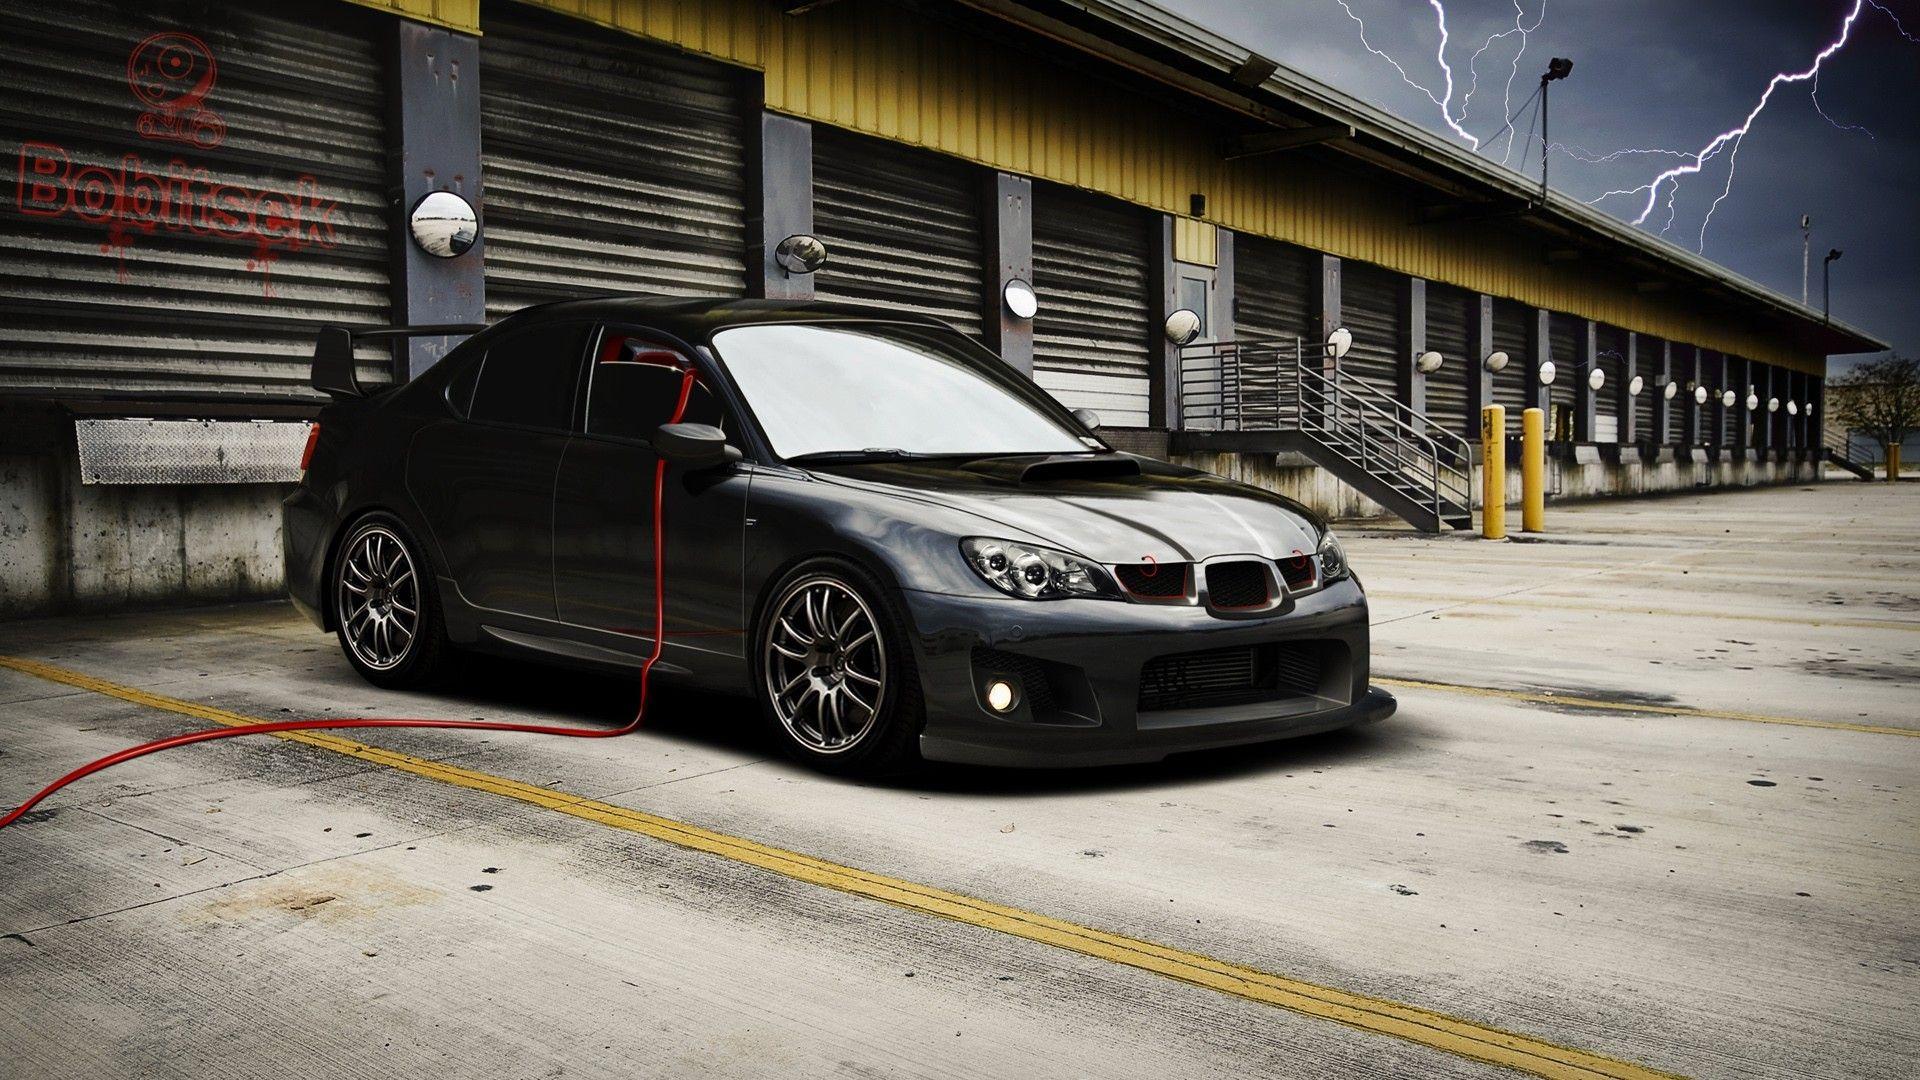 Subaru wrx jdm sti cars hd wallpaper - Subaru Impreza Sti Wrx Http Hellpapers Com Wallpapers View